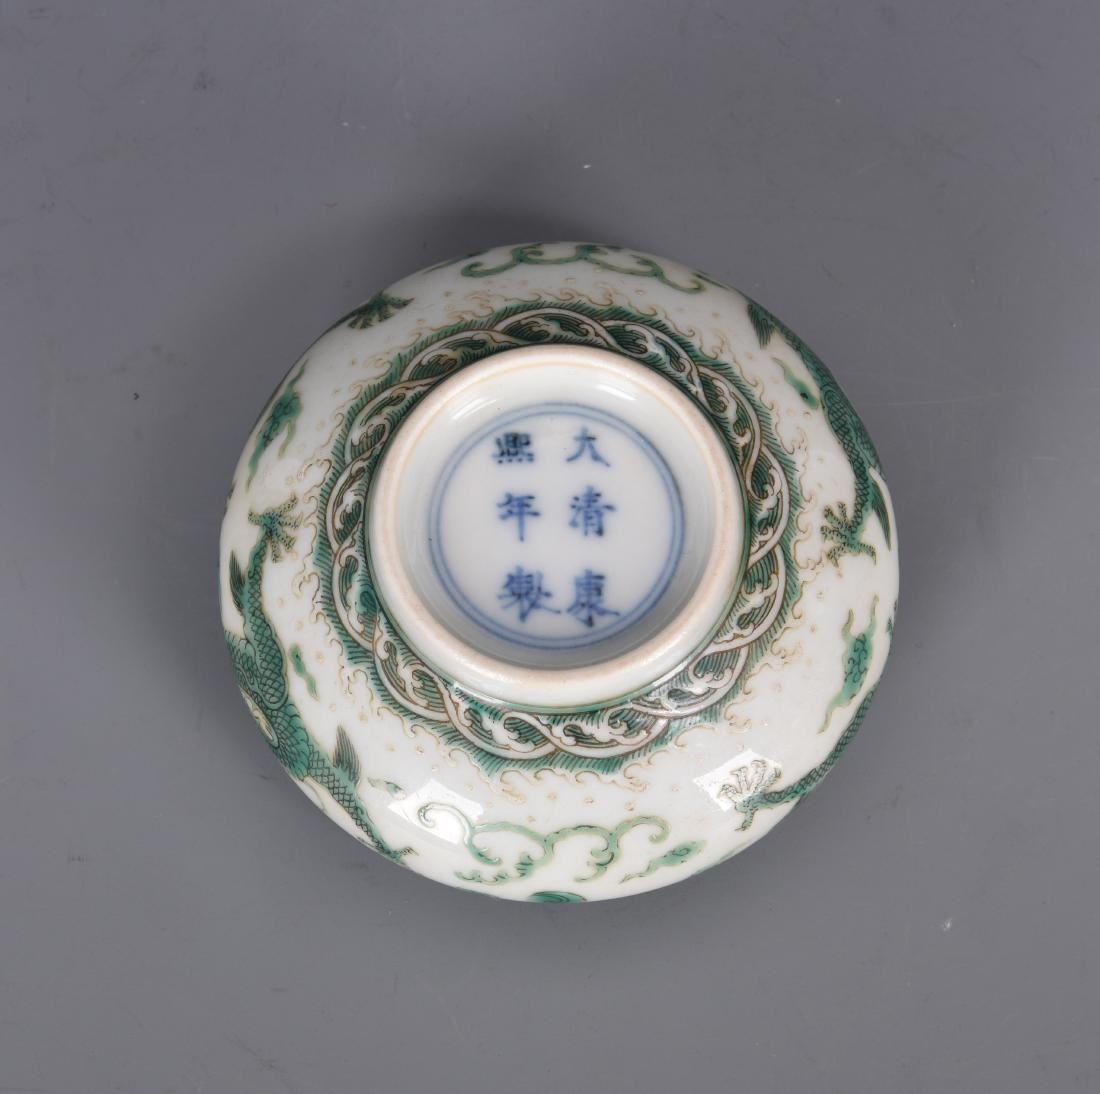 White Porcelain Dragon Bowl with mark - 9